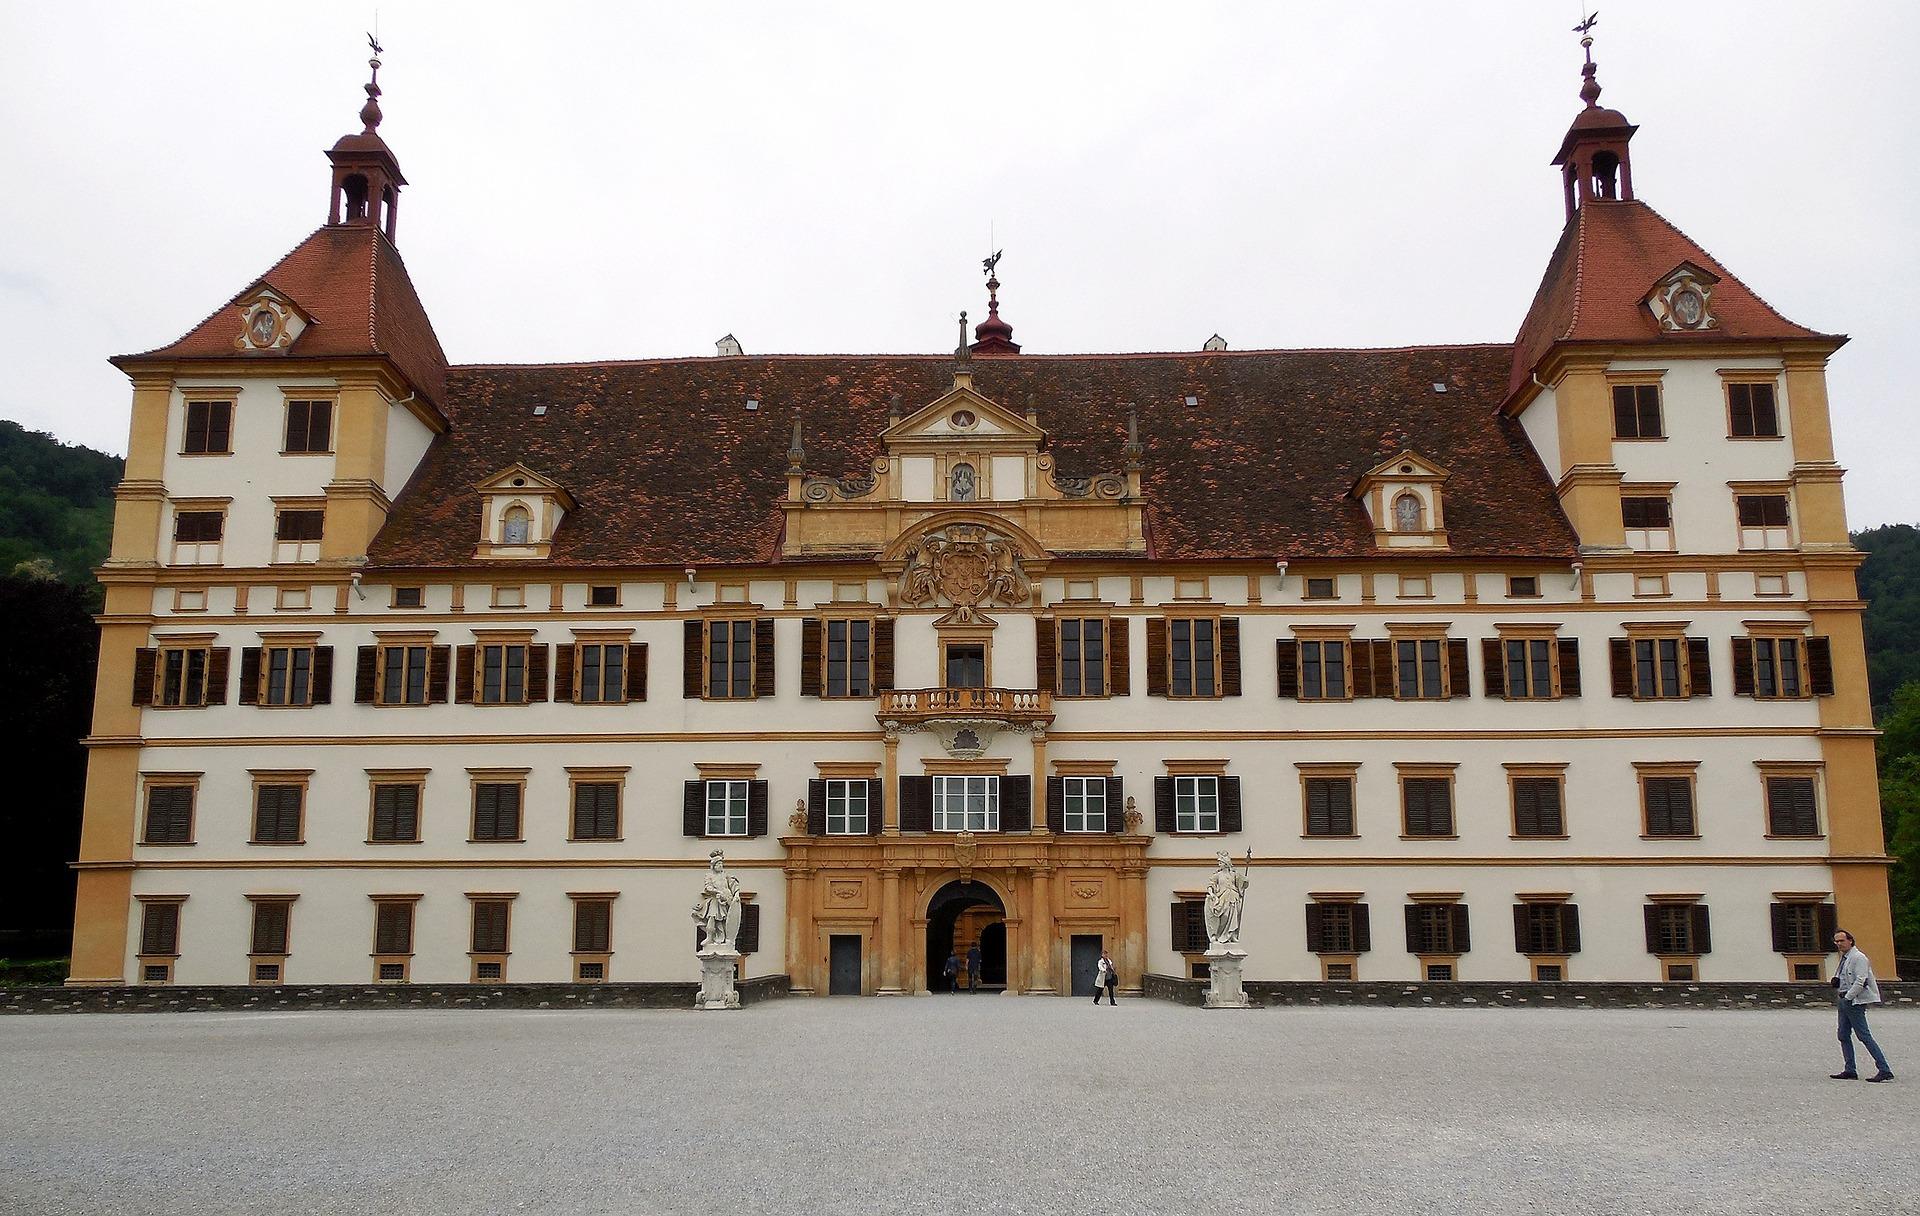 austrija, grac, grad, odmor, arhitektura